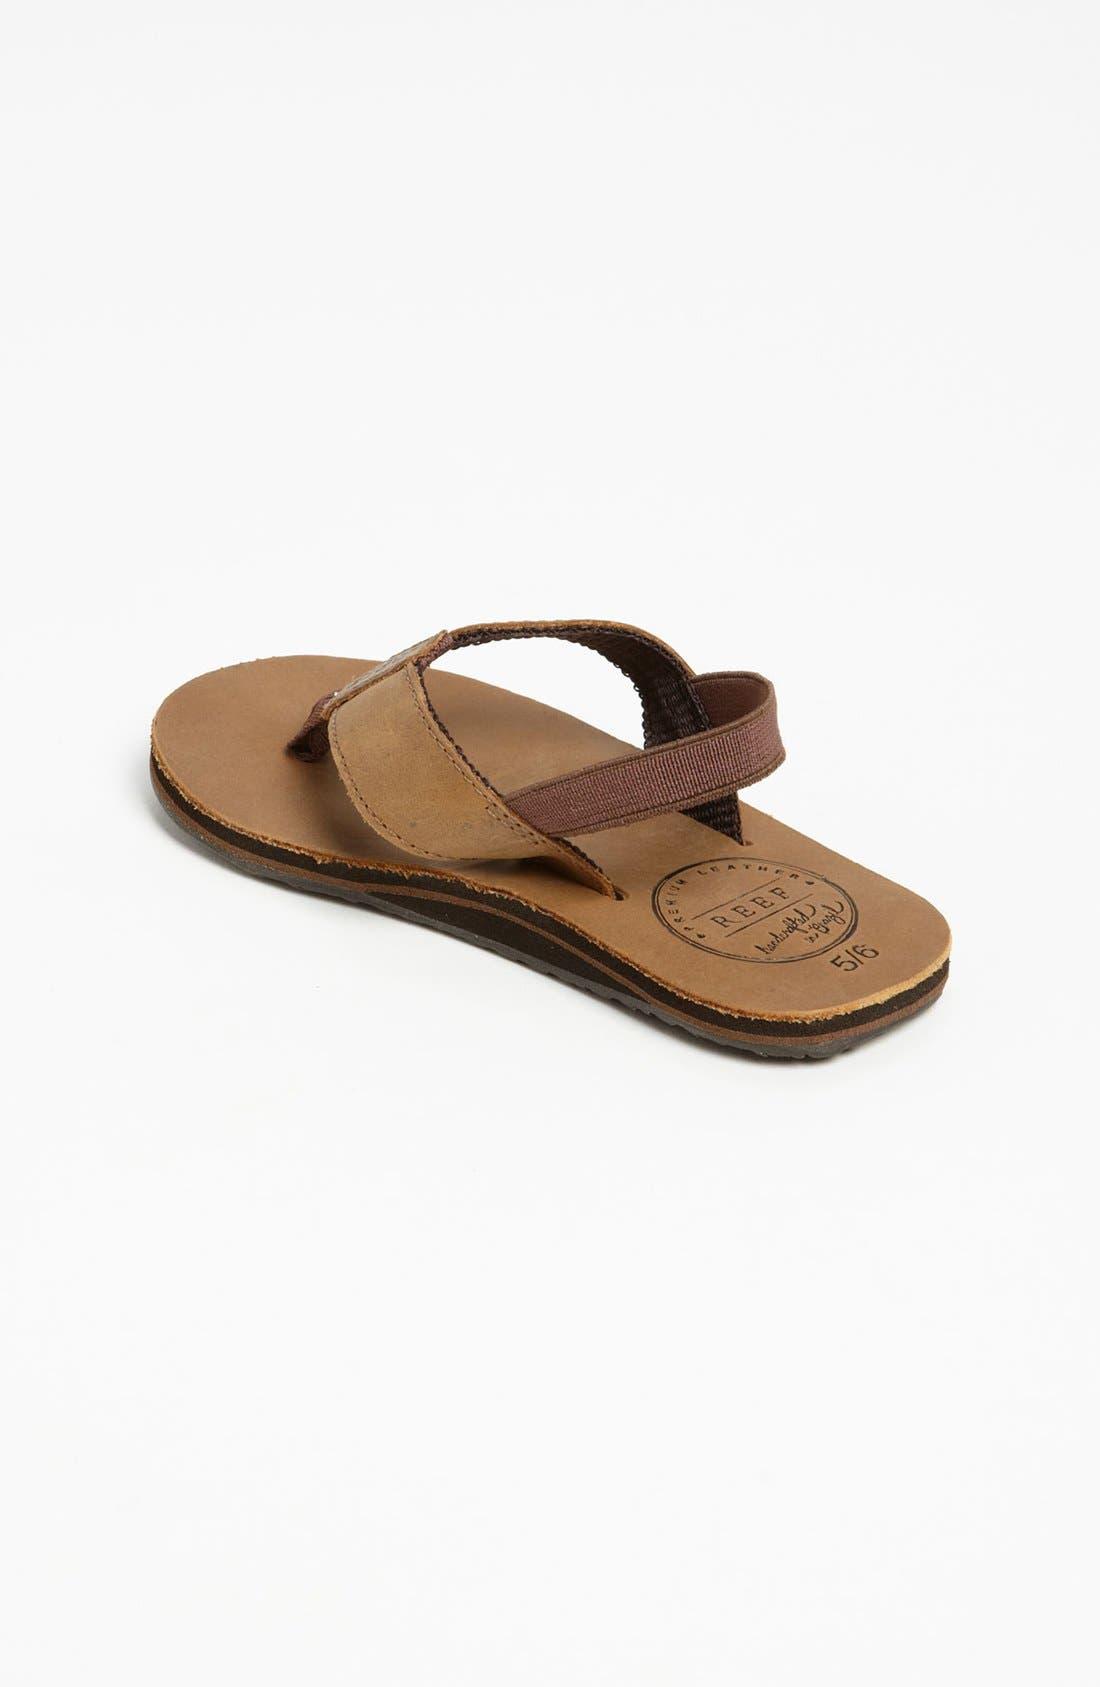 'Grom' Leather Flip-Flop,                             Alternate thumbnail 2, color,                             Bronze Brown